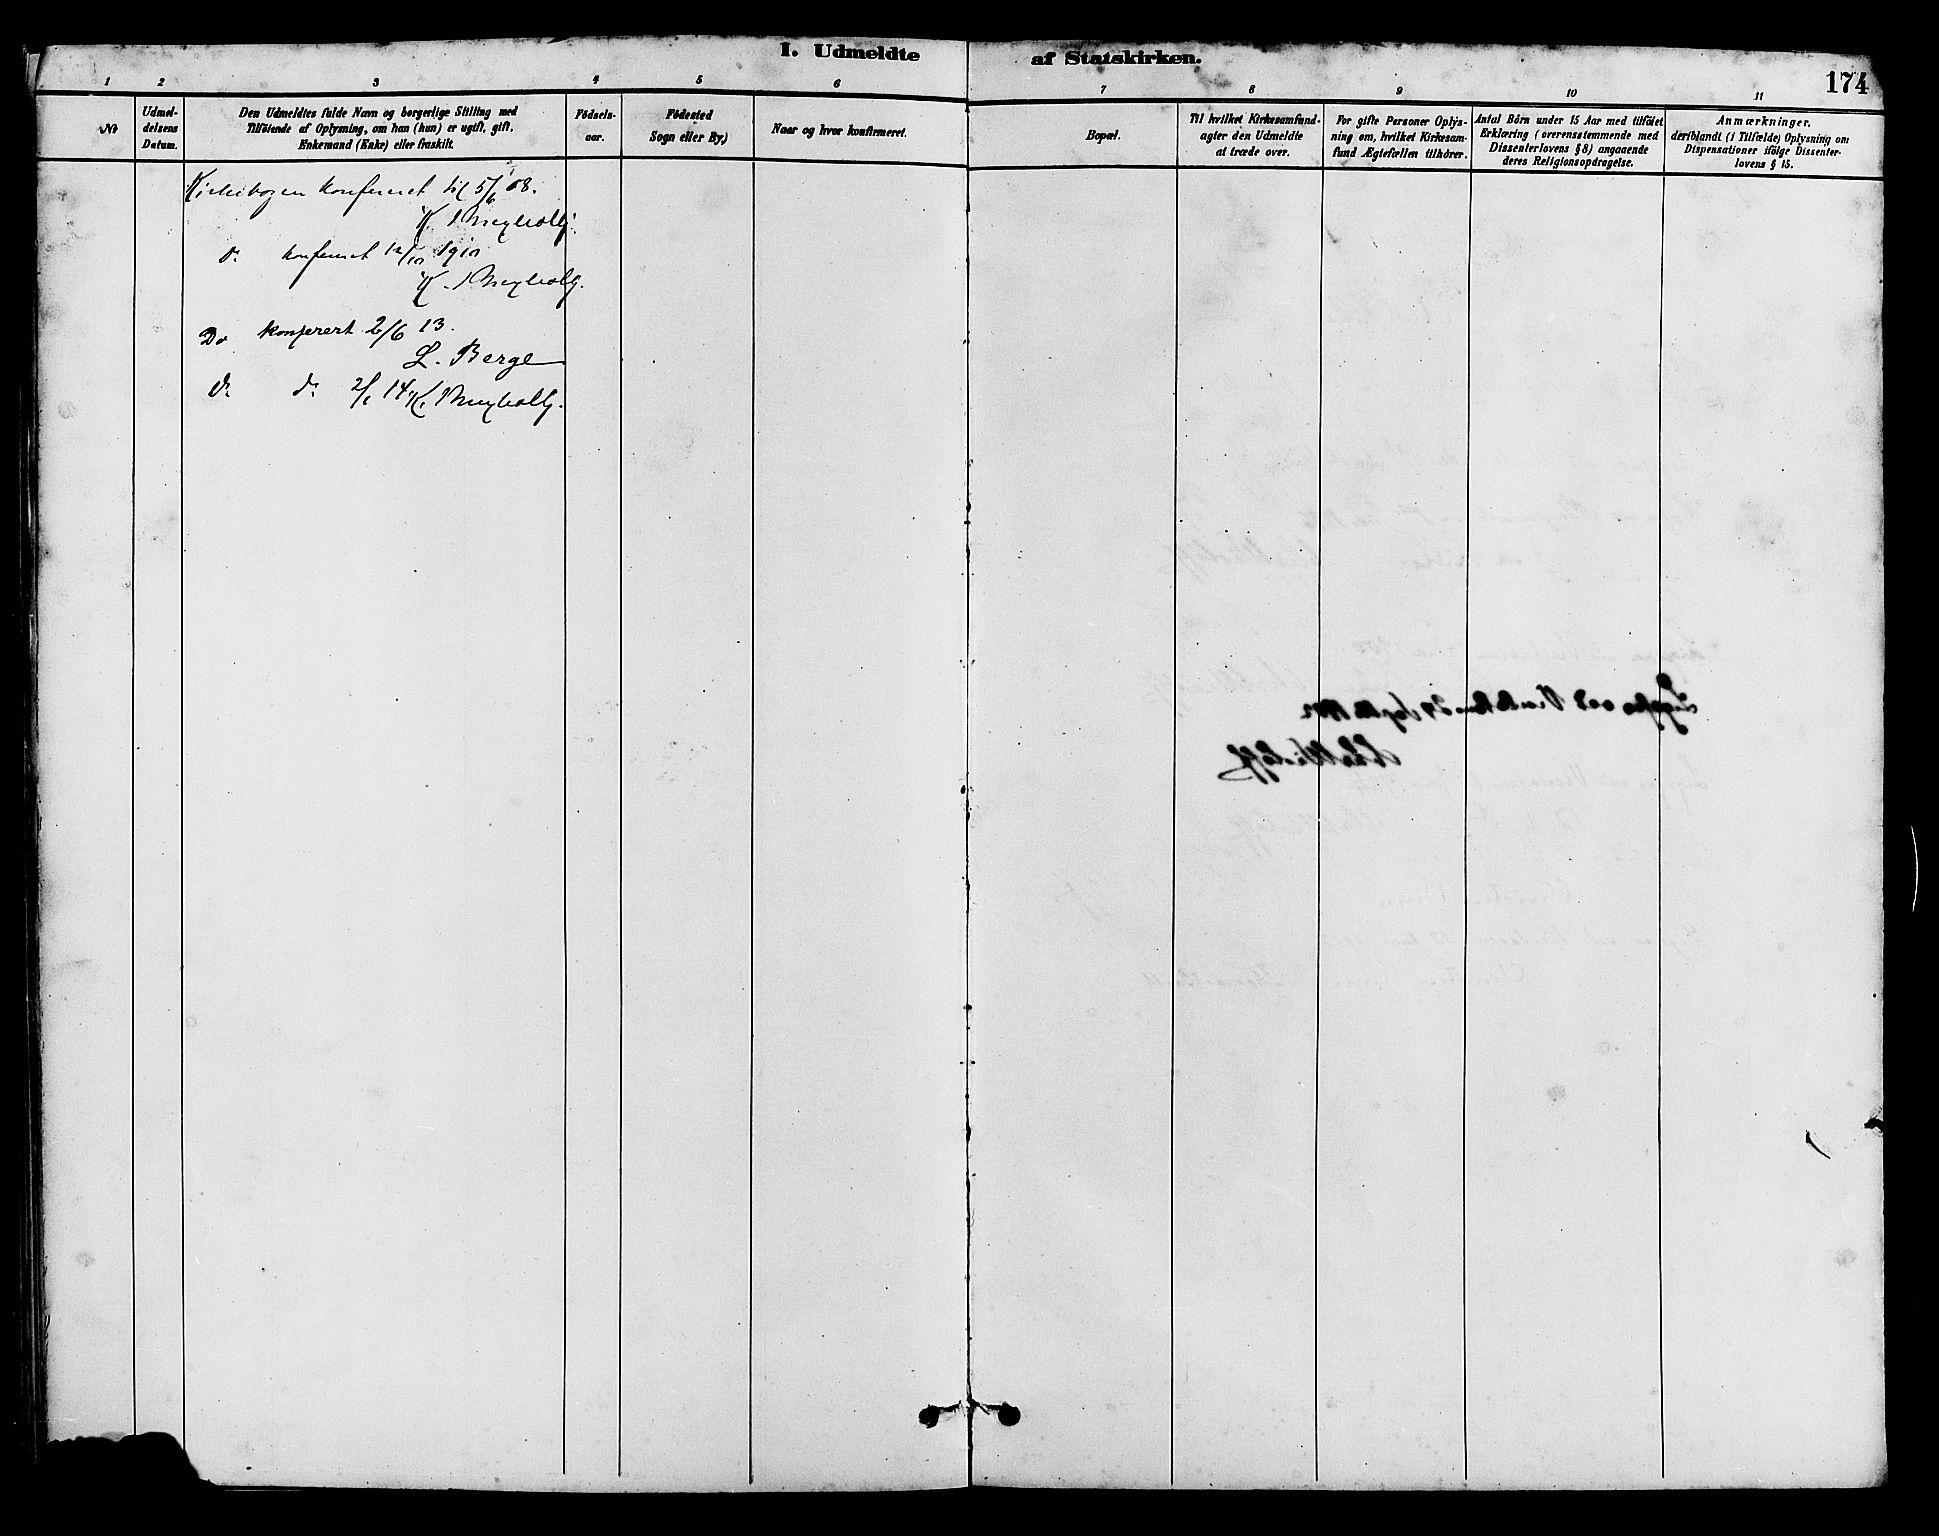 SAH, Vestre Slidre prestekontor, Klokkerbok nr. 5, 1881-1913, s. 174